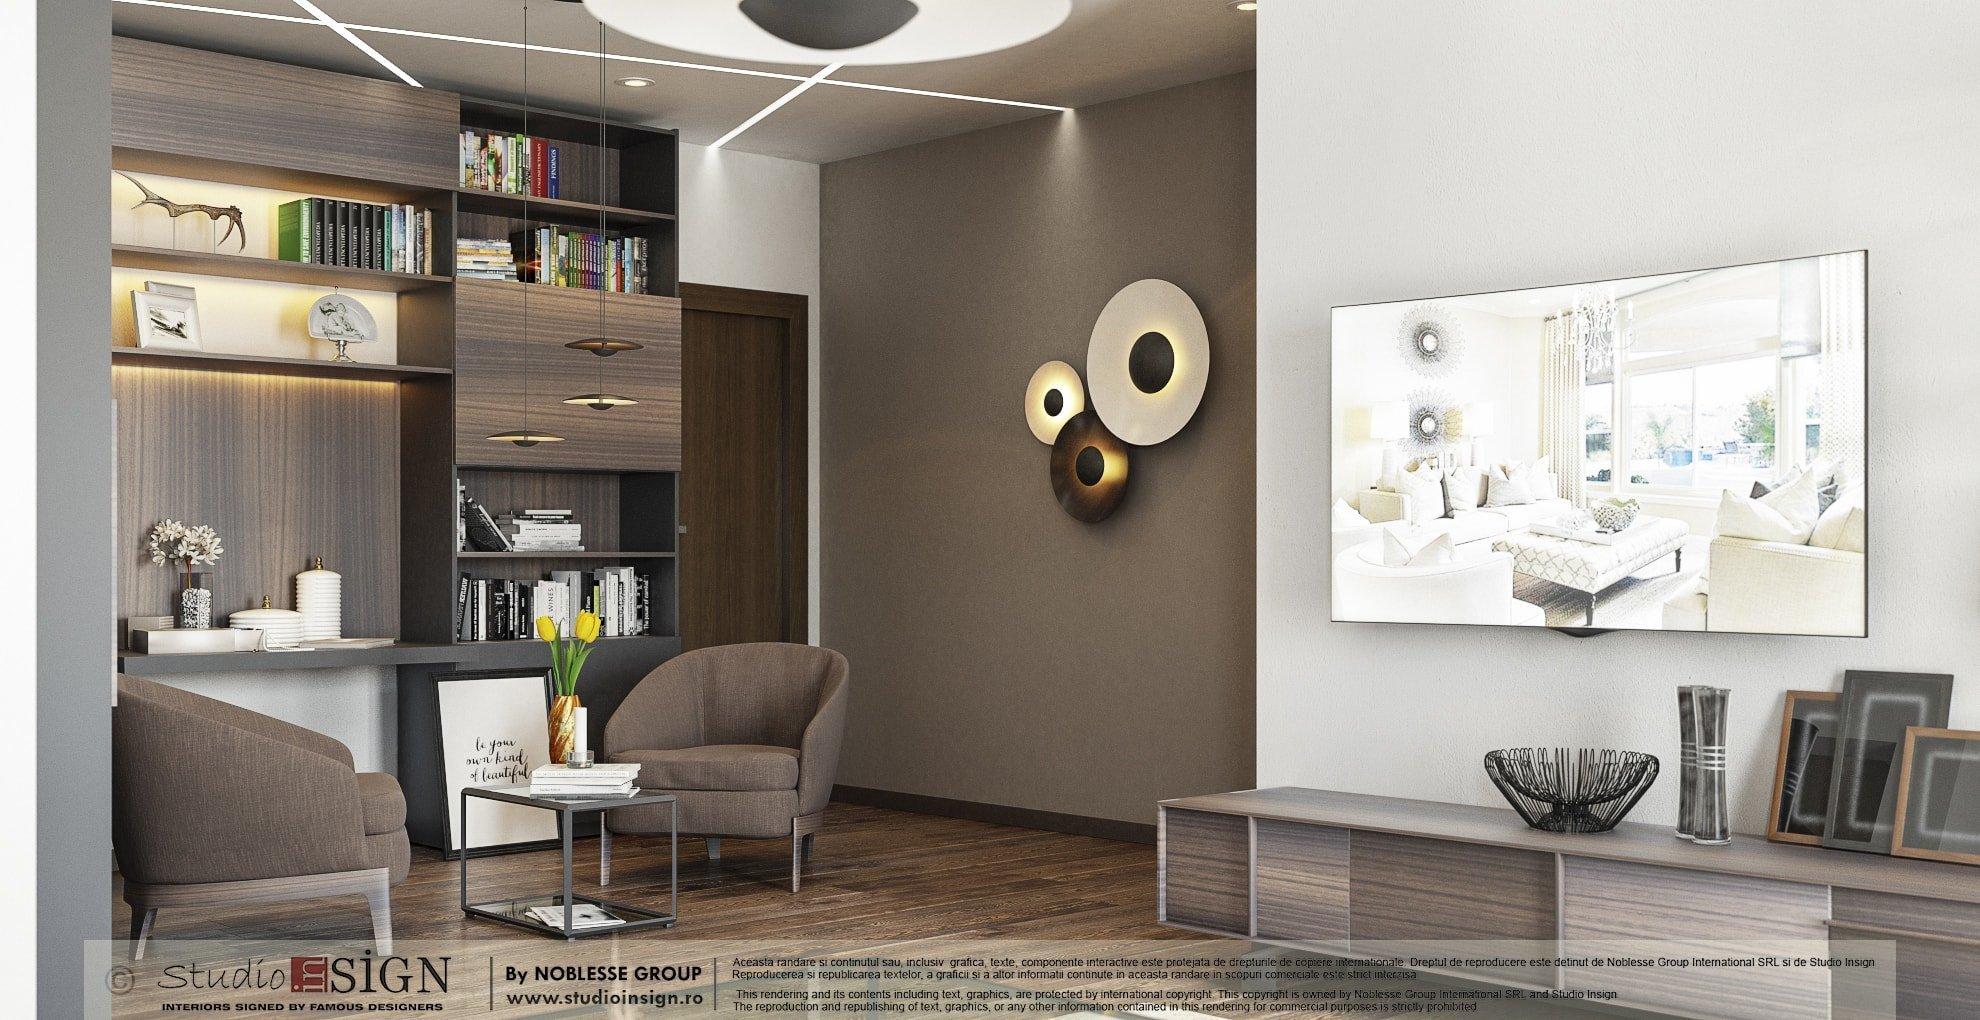 Apartment Reflexions Modern Interior Design Studio Insign